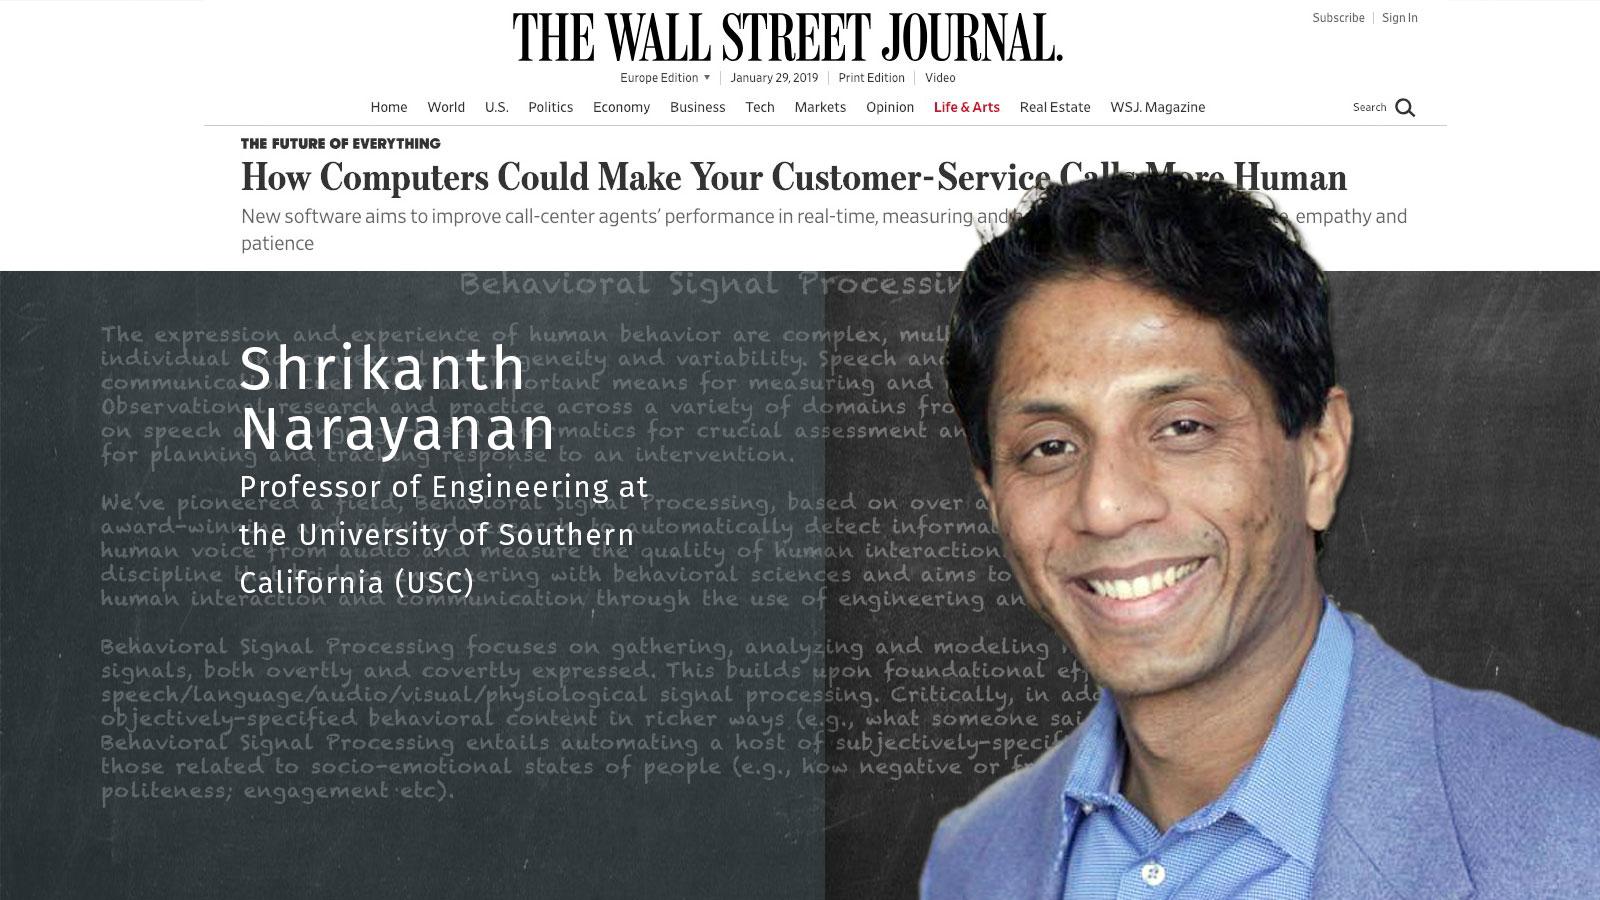 Shri Narayanan, Behavioral Signals, How Computers Could Make Your Customer-Service Calls More Human